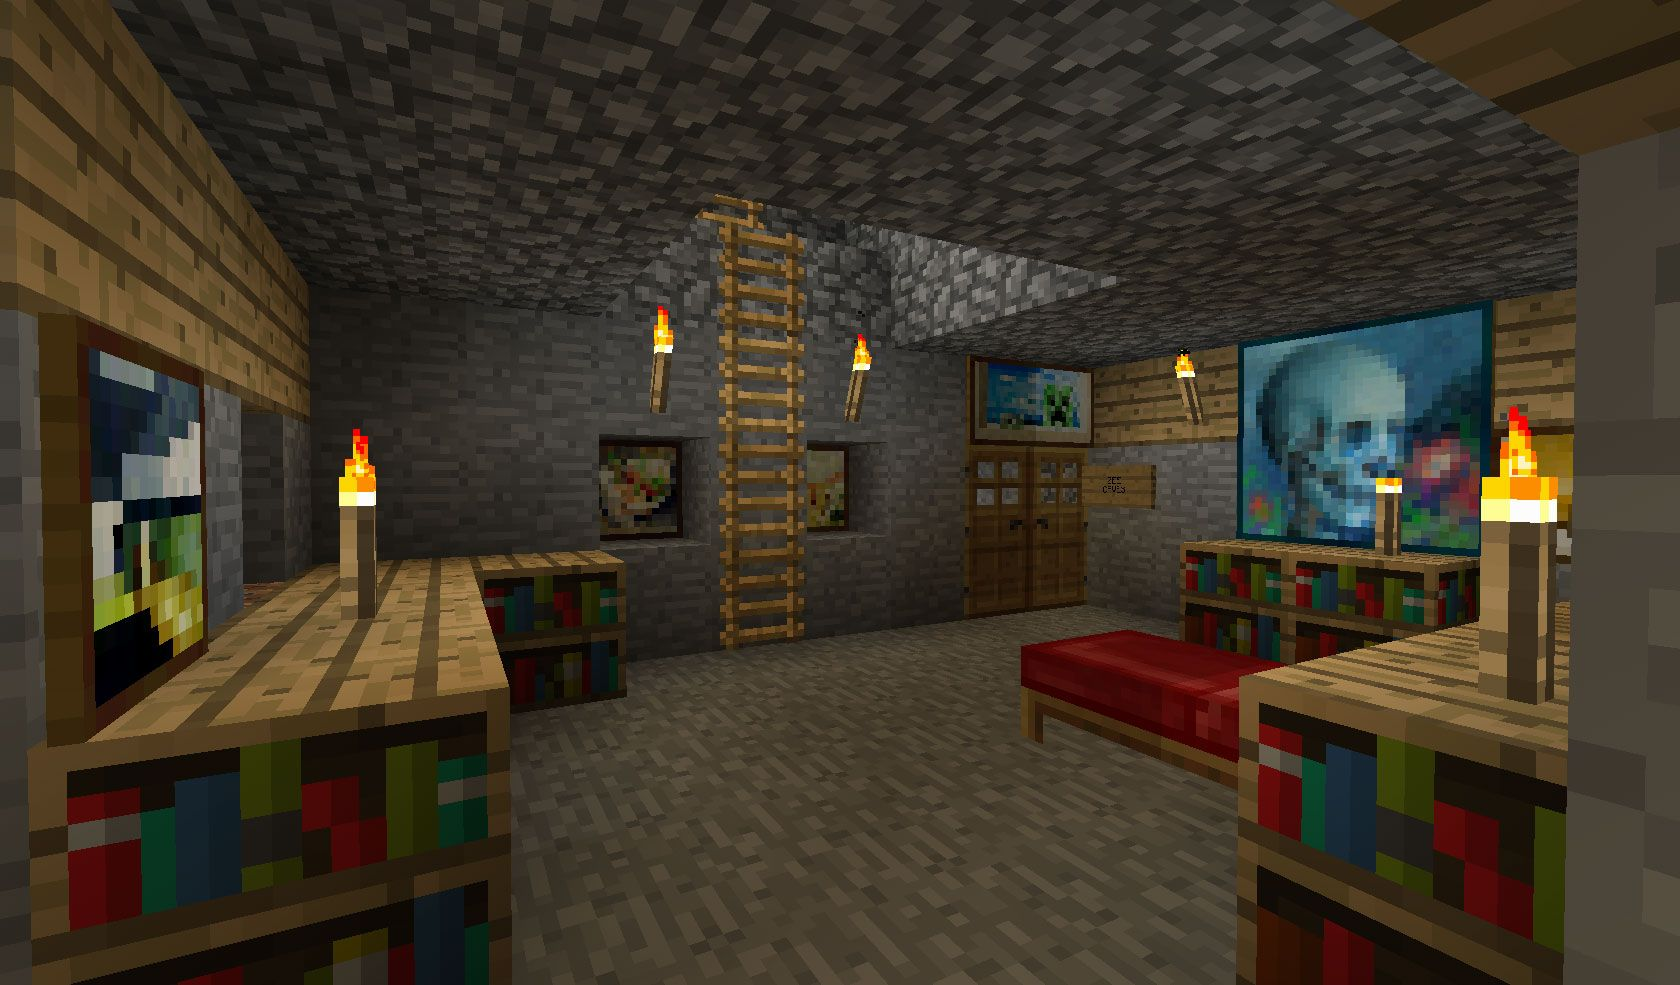 minecraft room ideas pocket edition  Minecraft